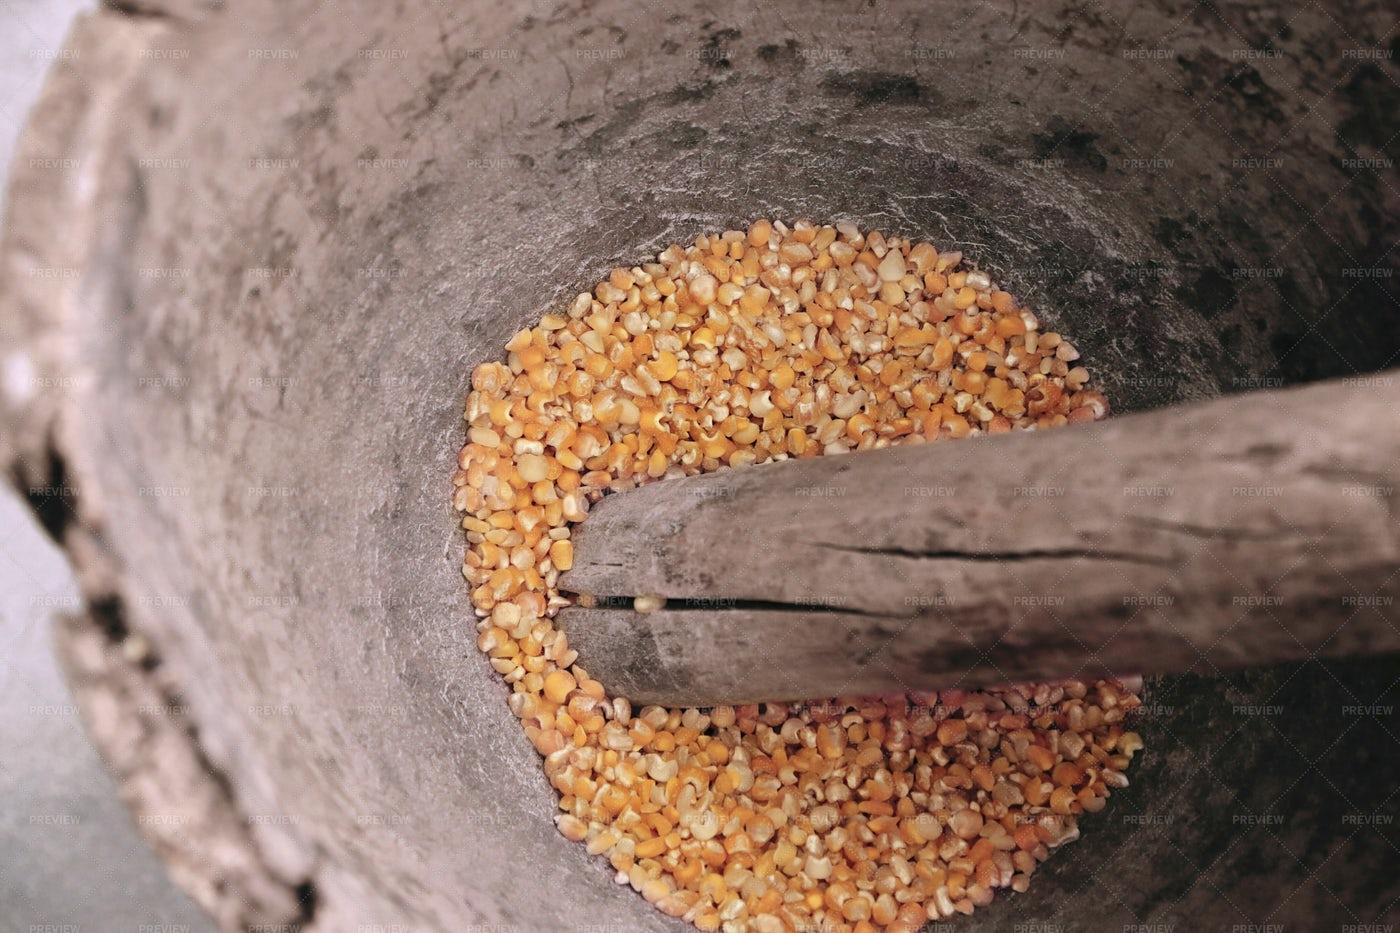 Corn And Pestle Inside Mortar: Stock Photos